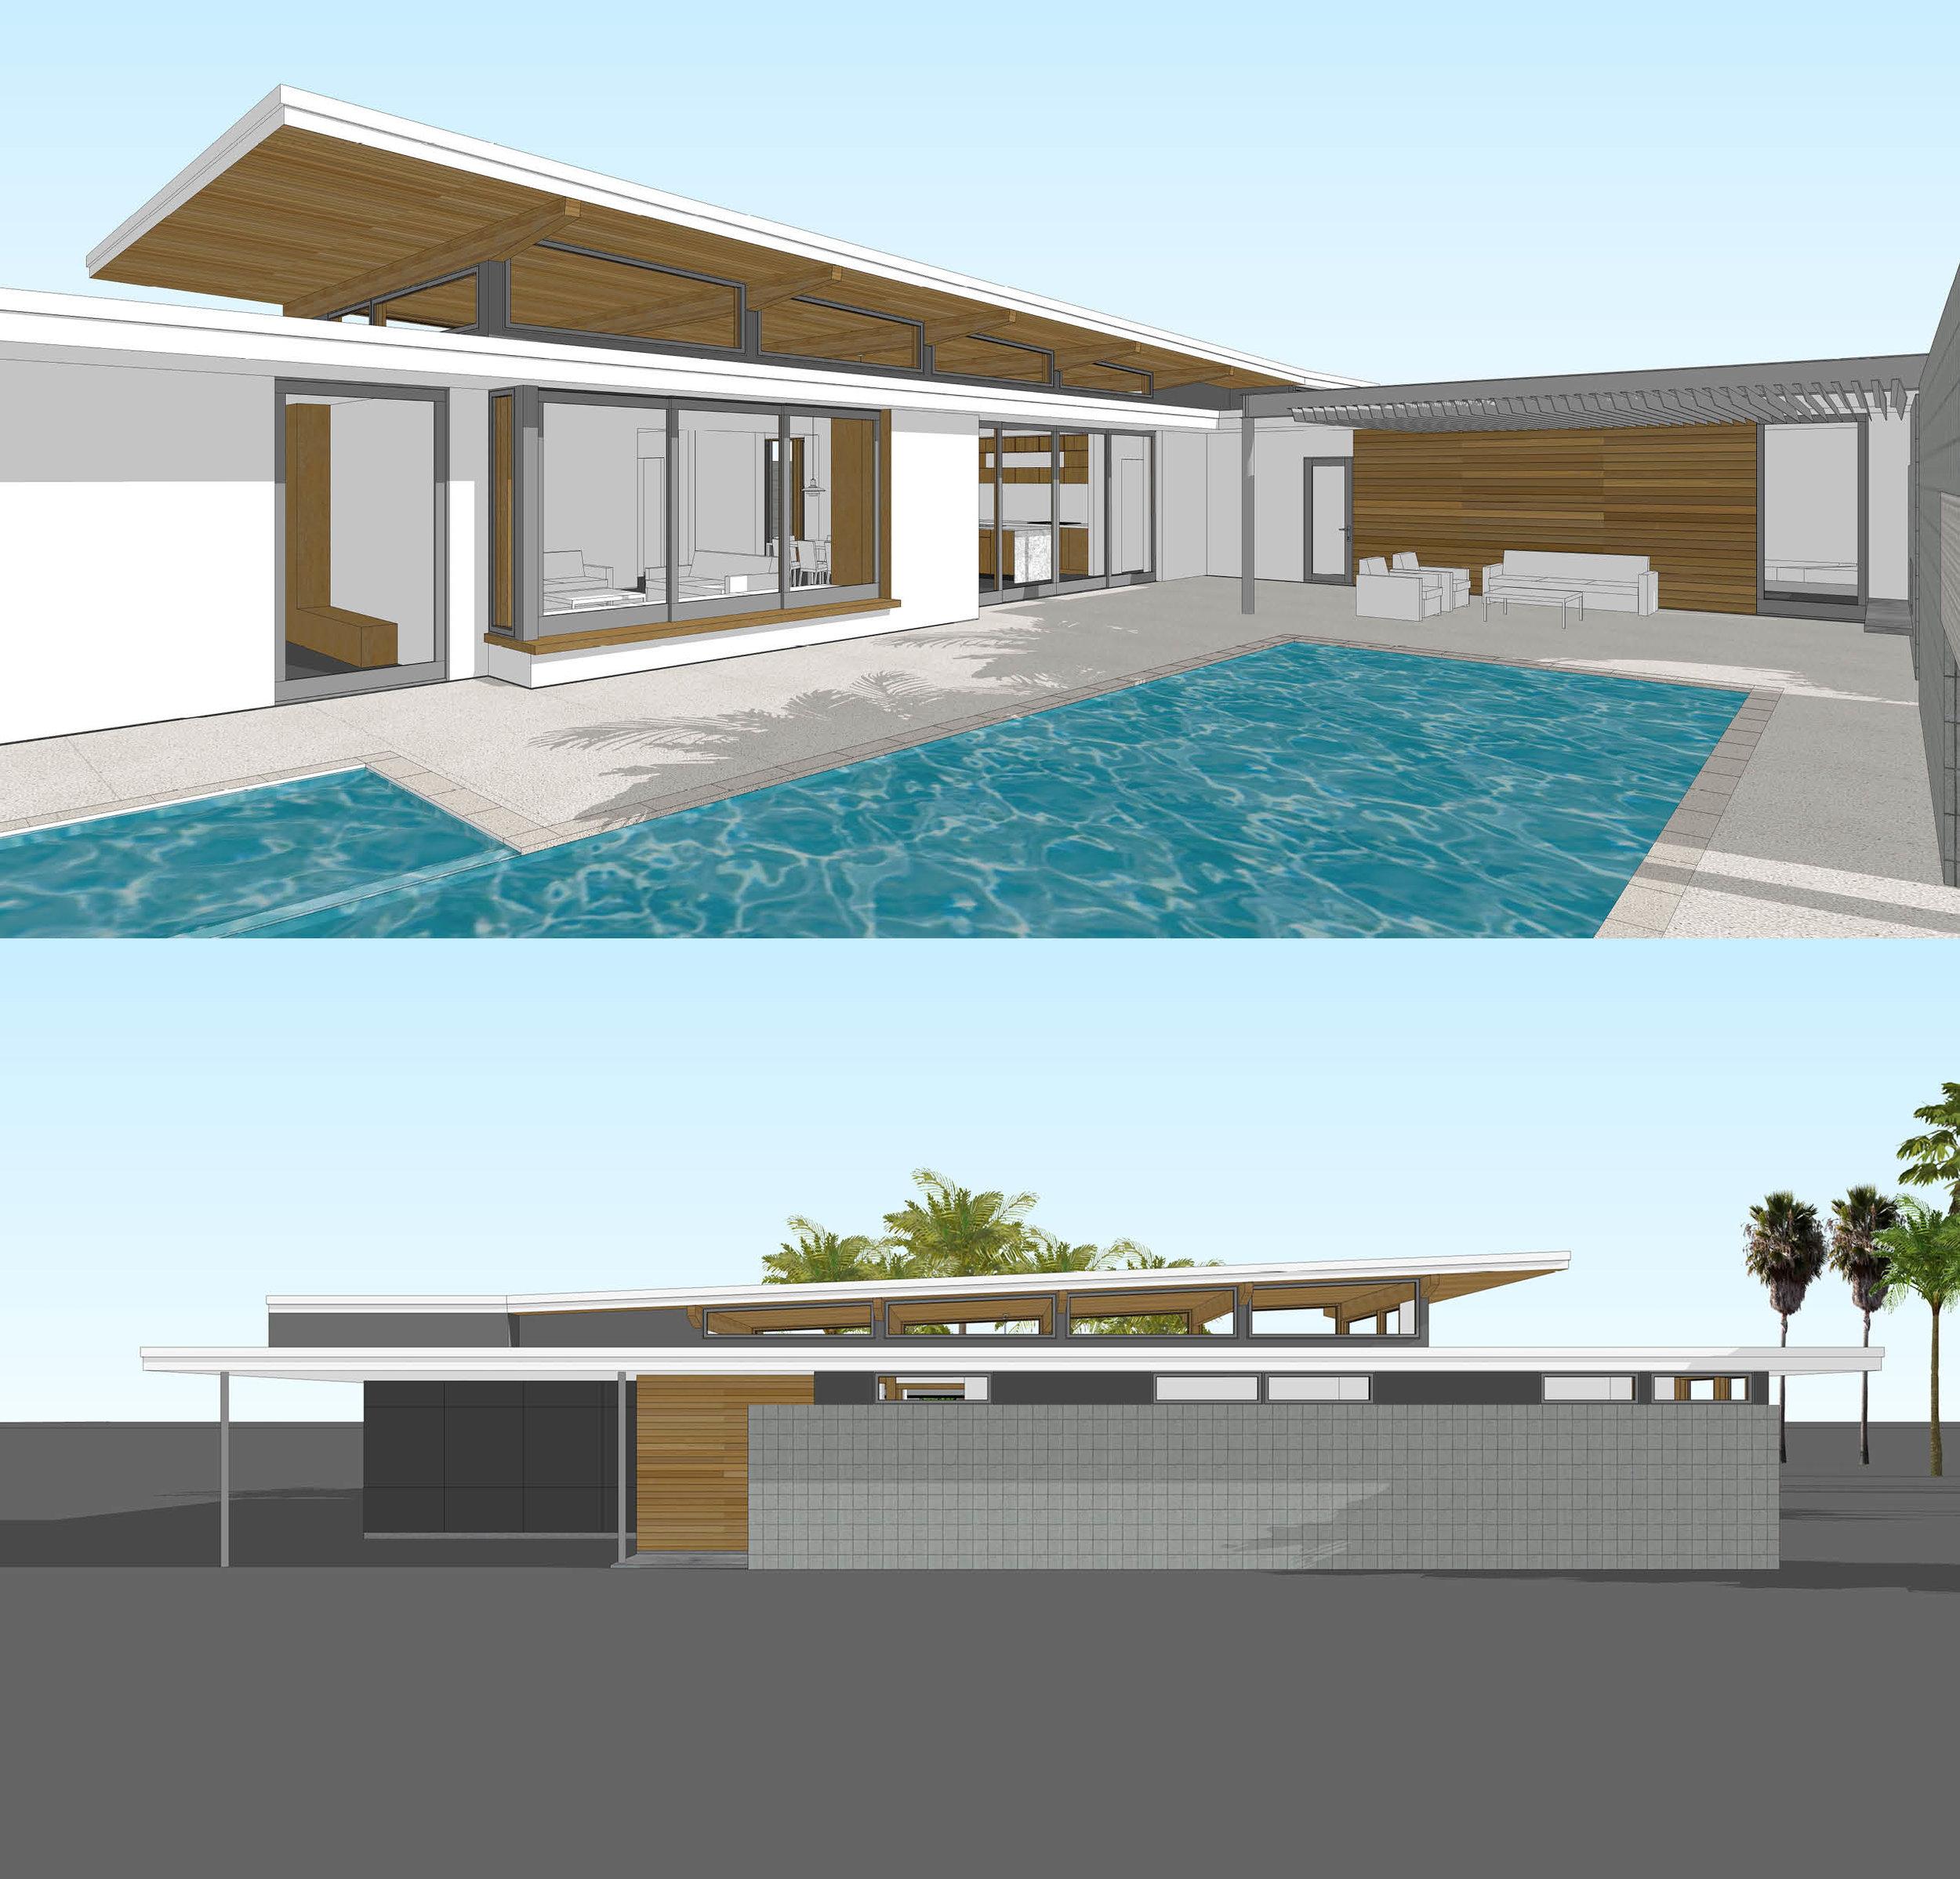 turkel_design_modern_prefab_home_axiomdeserthouse_cladding_study_optionA.JPG